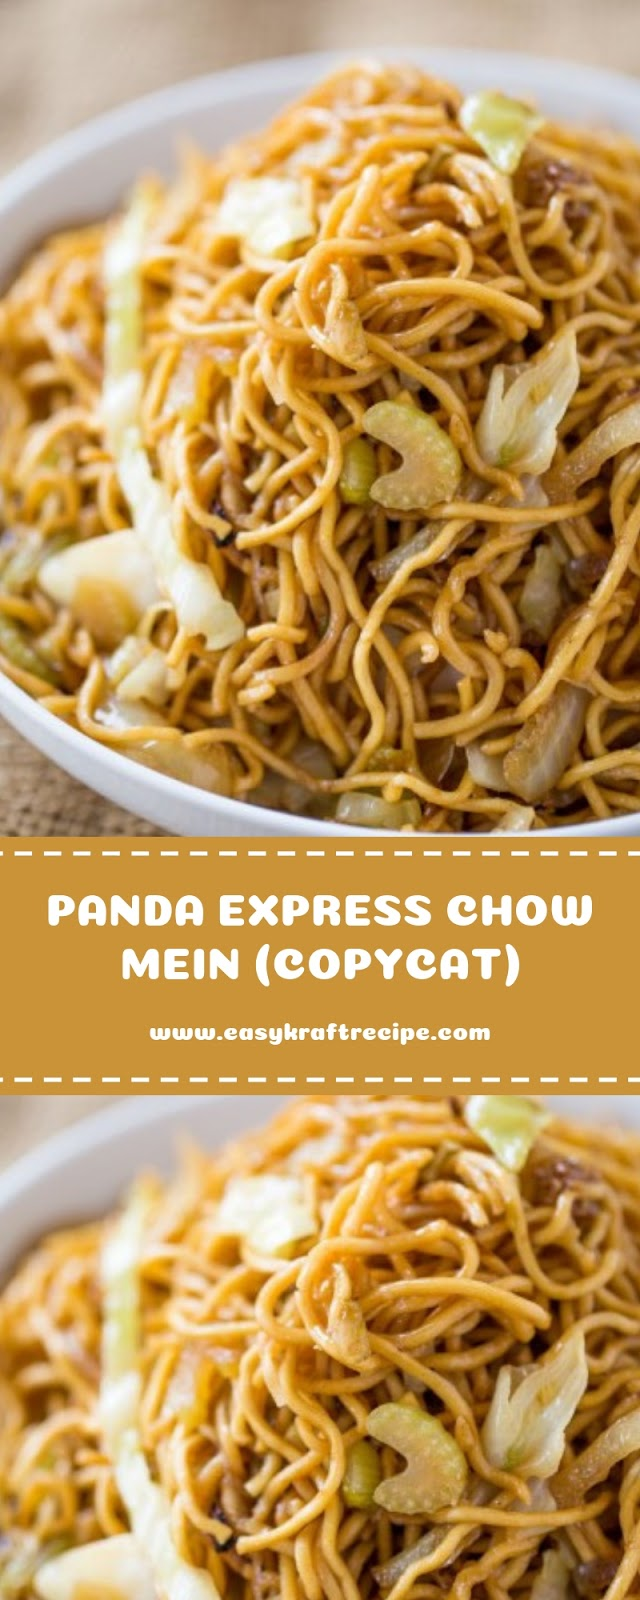 PANDA EXPRESS CHOW MEIN (COPYCAT)